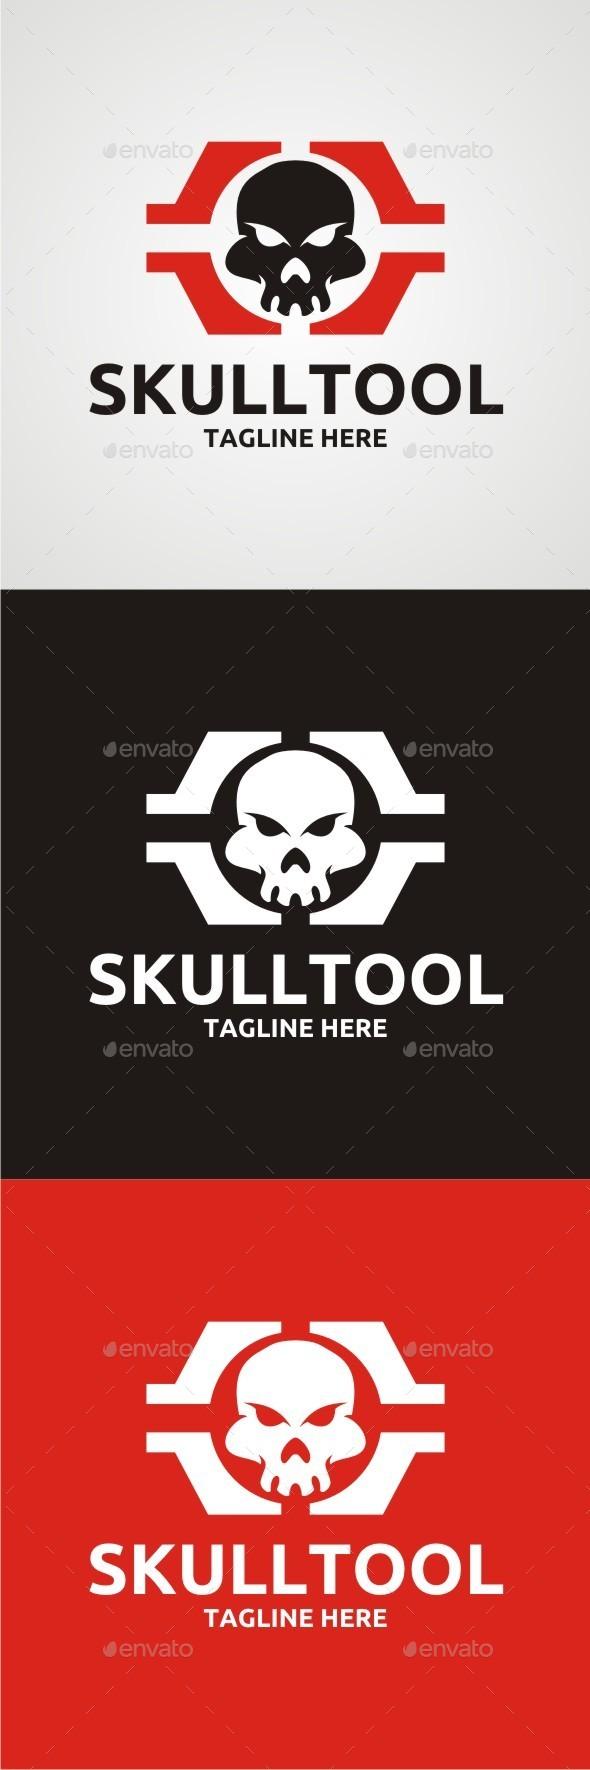 GraphicRiver Skulltool 10002874